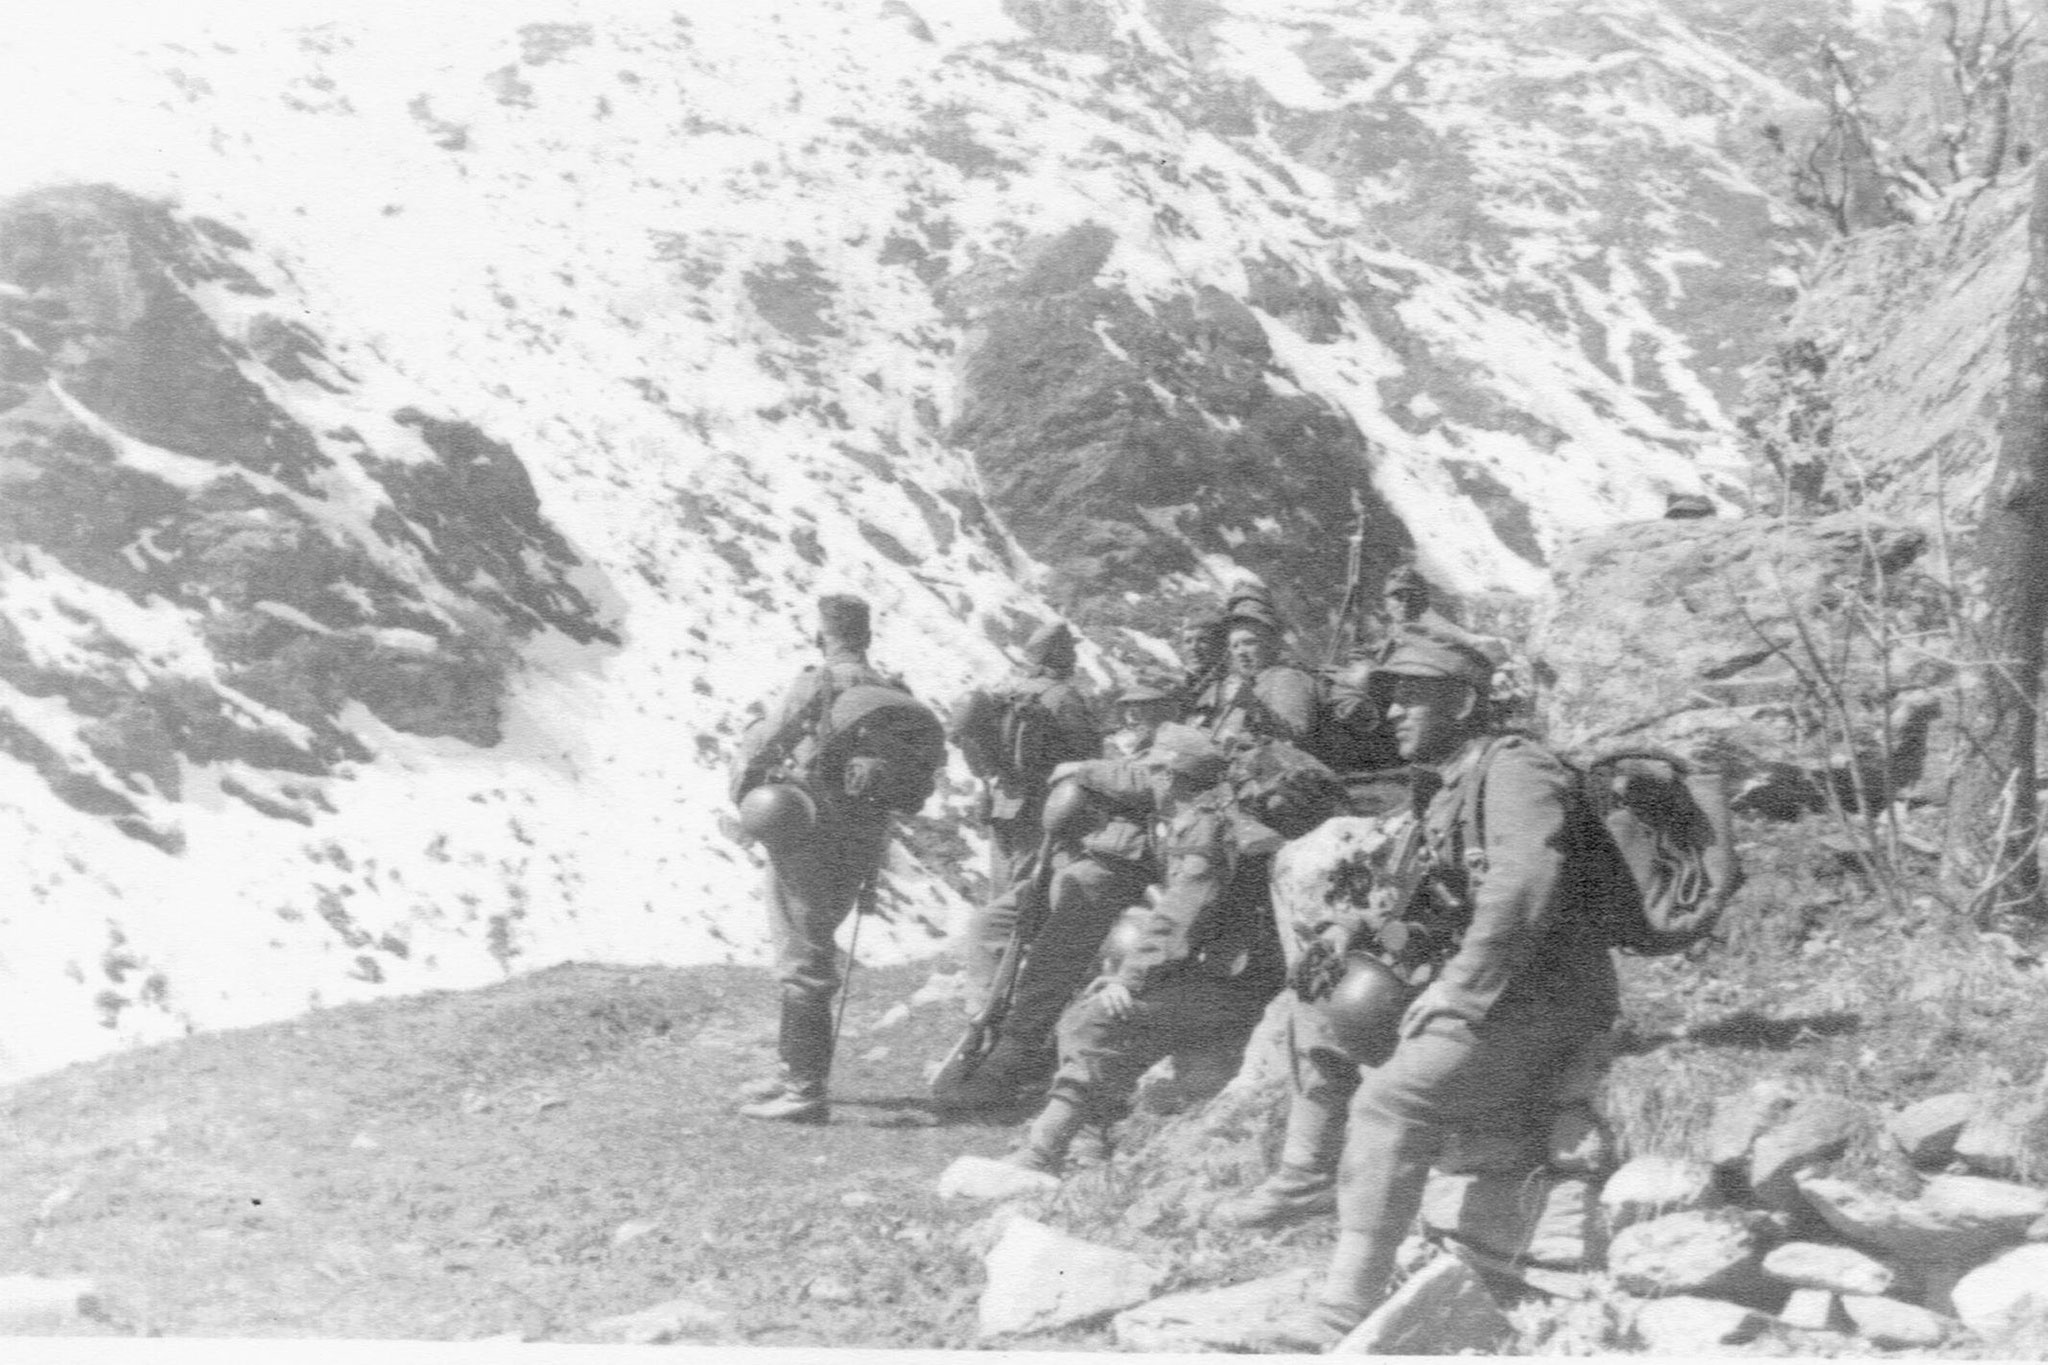 Reparti del SS-Polizei Regiment 15 in azione di rastrellamento (Susanne Pauli, NS-Familien Geschichte, Göttingen via Raphael Rues, www.insubricahistorica.it)